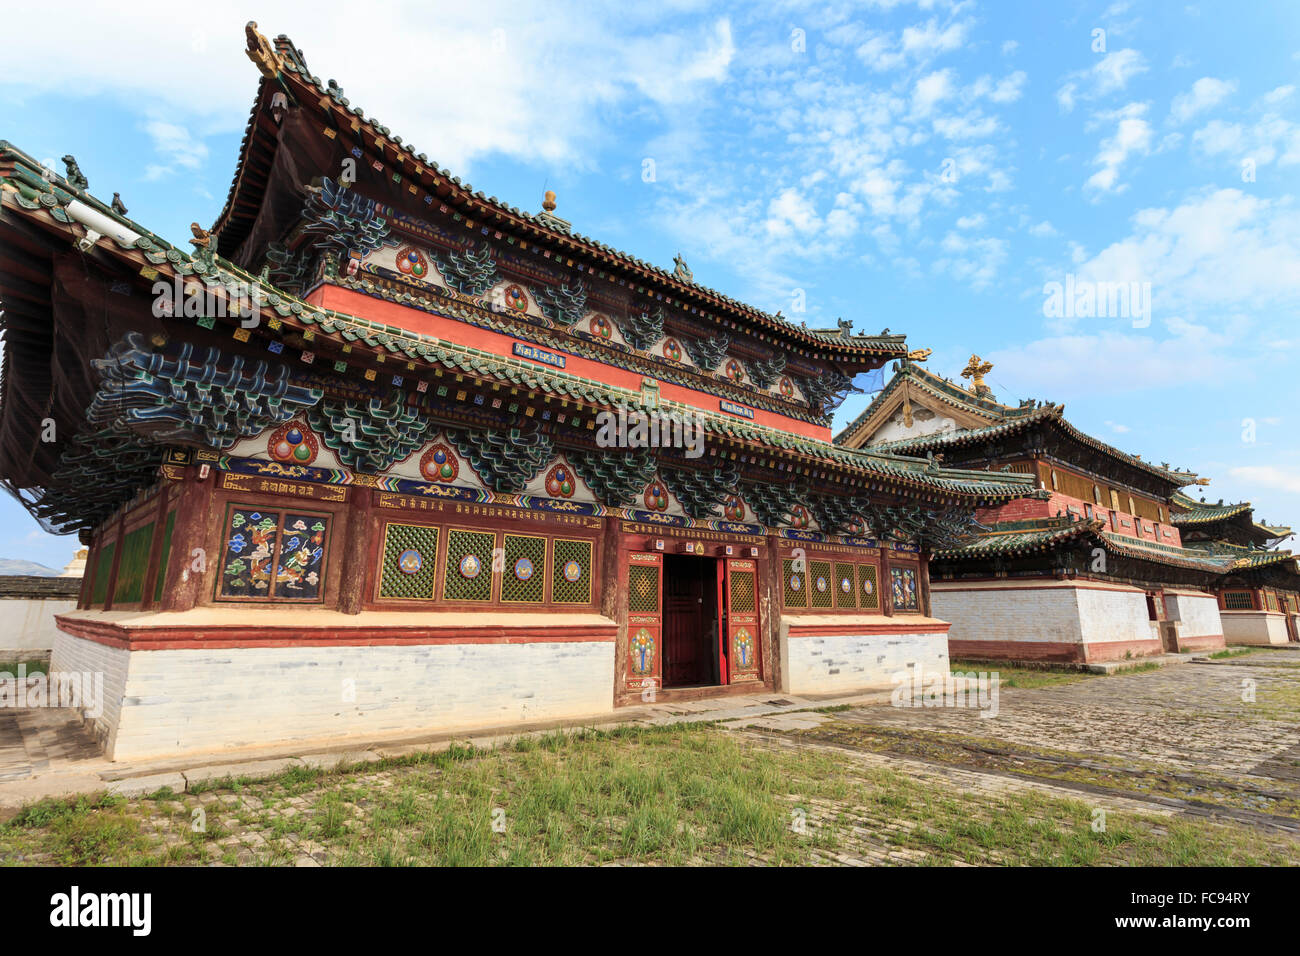 Baruun Zuu temple, Erdene Zuu Khiid, Buddhist Monastery, Kharkhorin (Karakorum), Central Mongolia, Central Asia, - Stock Image